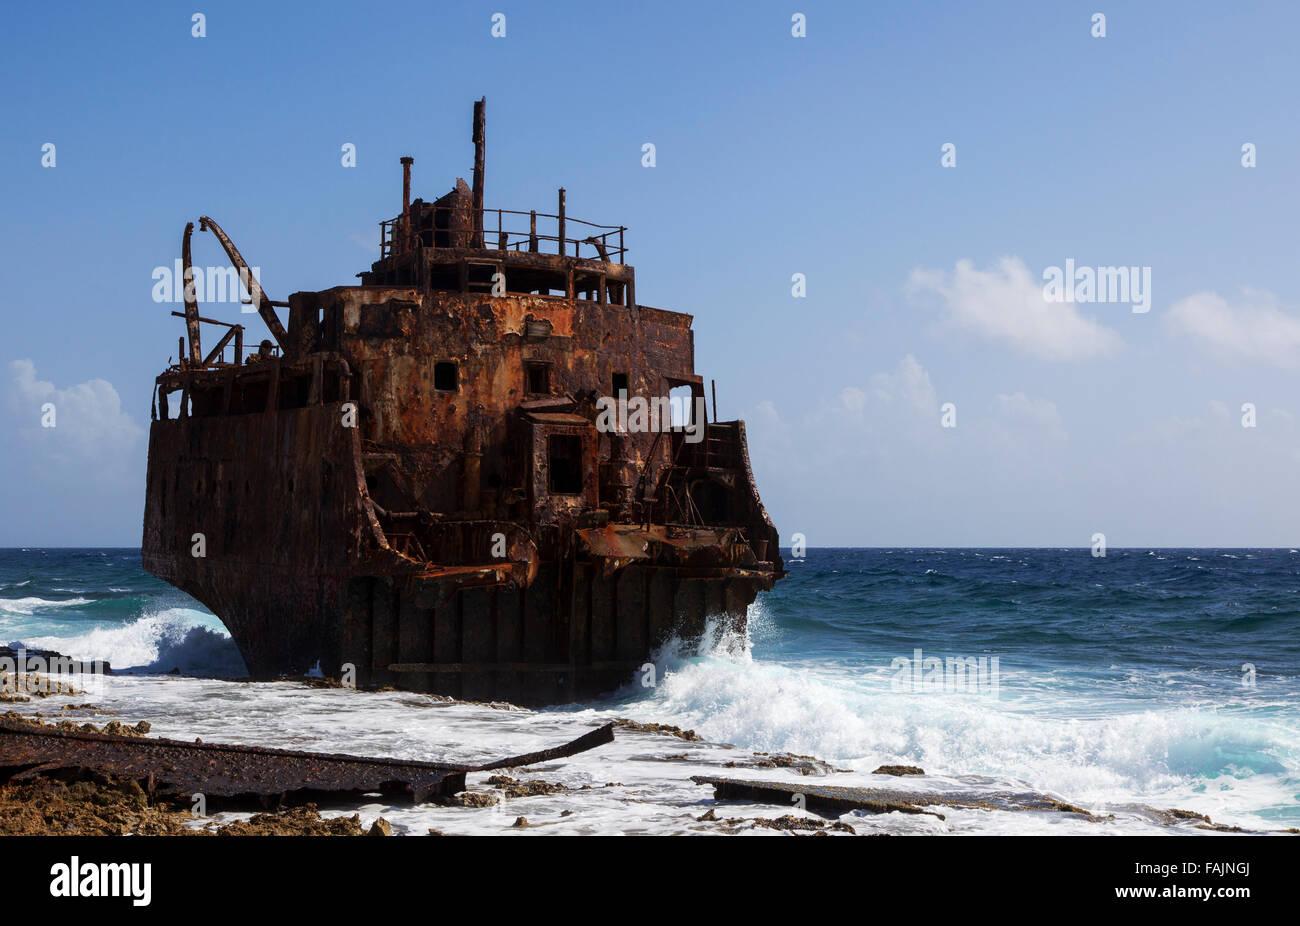 Ein Schiffswrack auf Klein Curacao, Curacao Stockbild